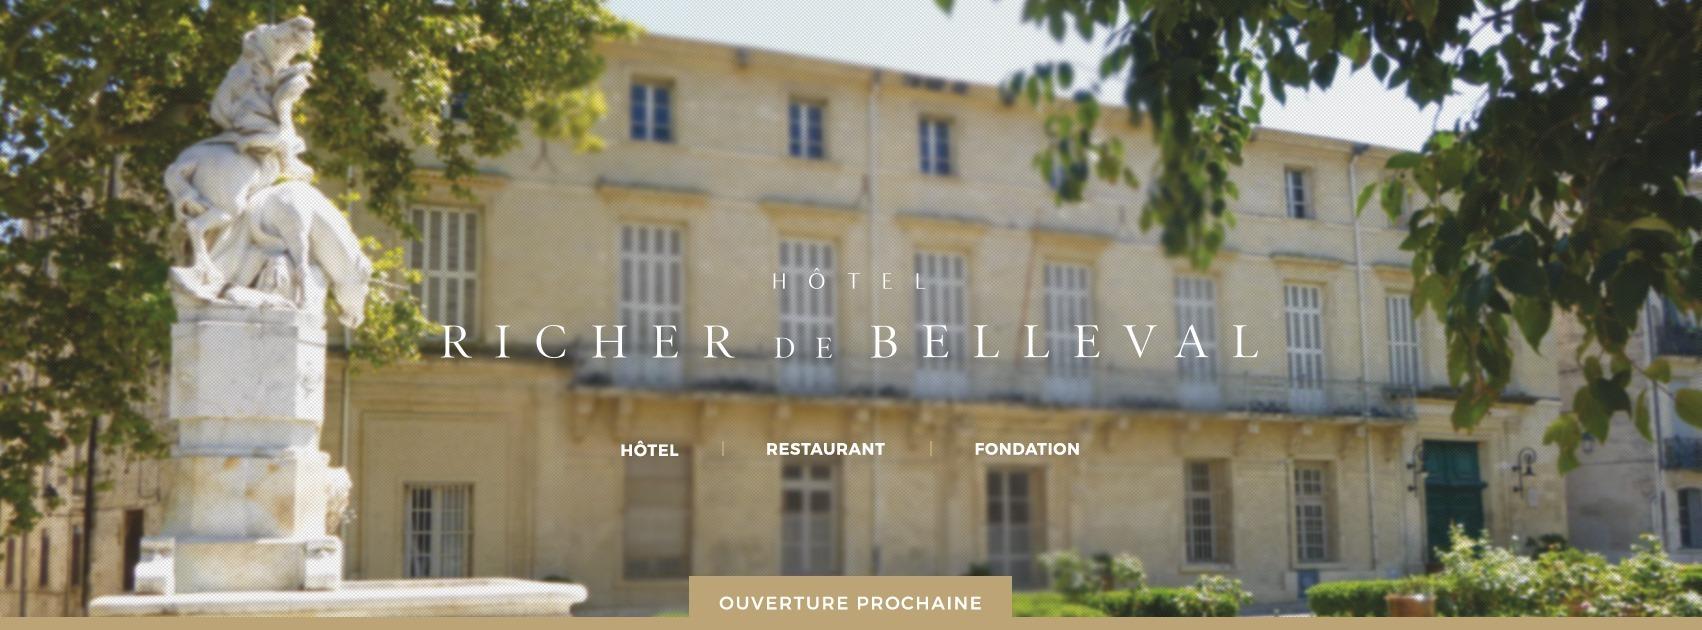 Le Jardin des Sens - Hôtel Richer de Belleval (Opening Juin 2021)